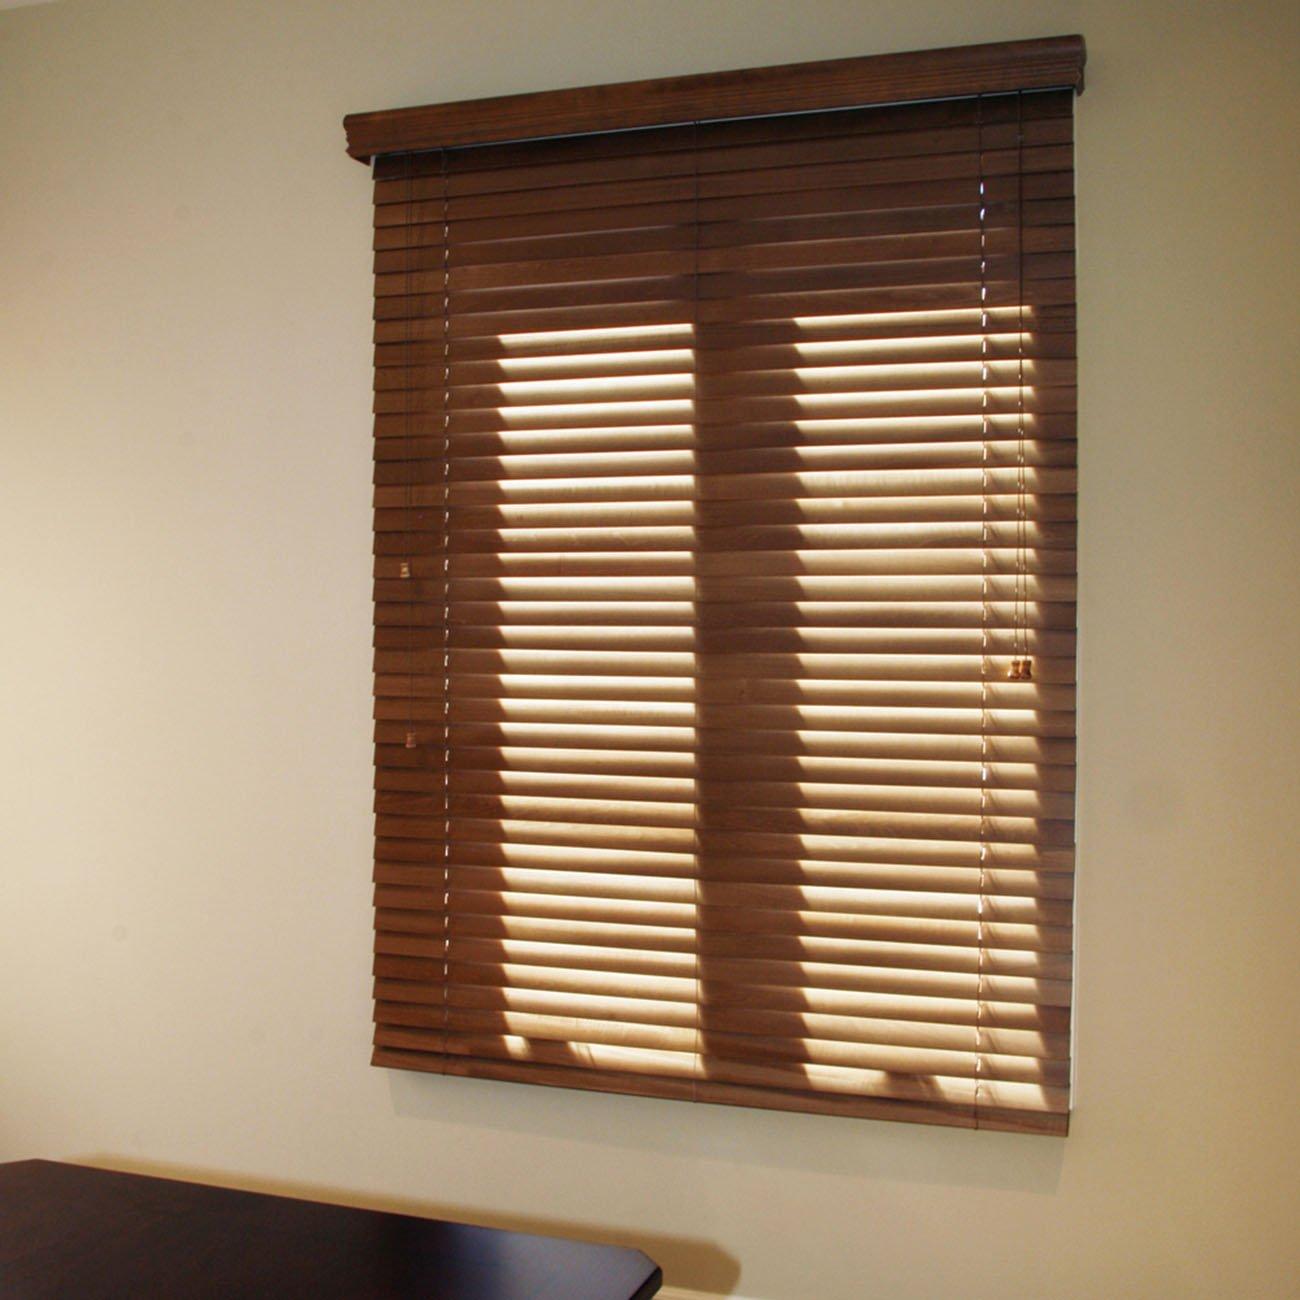 "Chicology Faux Wood Blind, Realistic Wood Grain Embossing, Blaze Brown (Brown), 43""x64"""